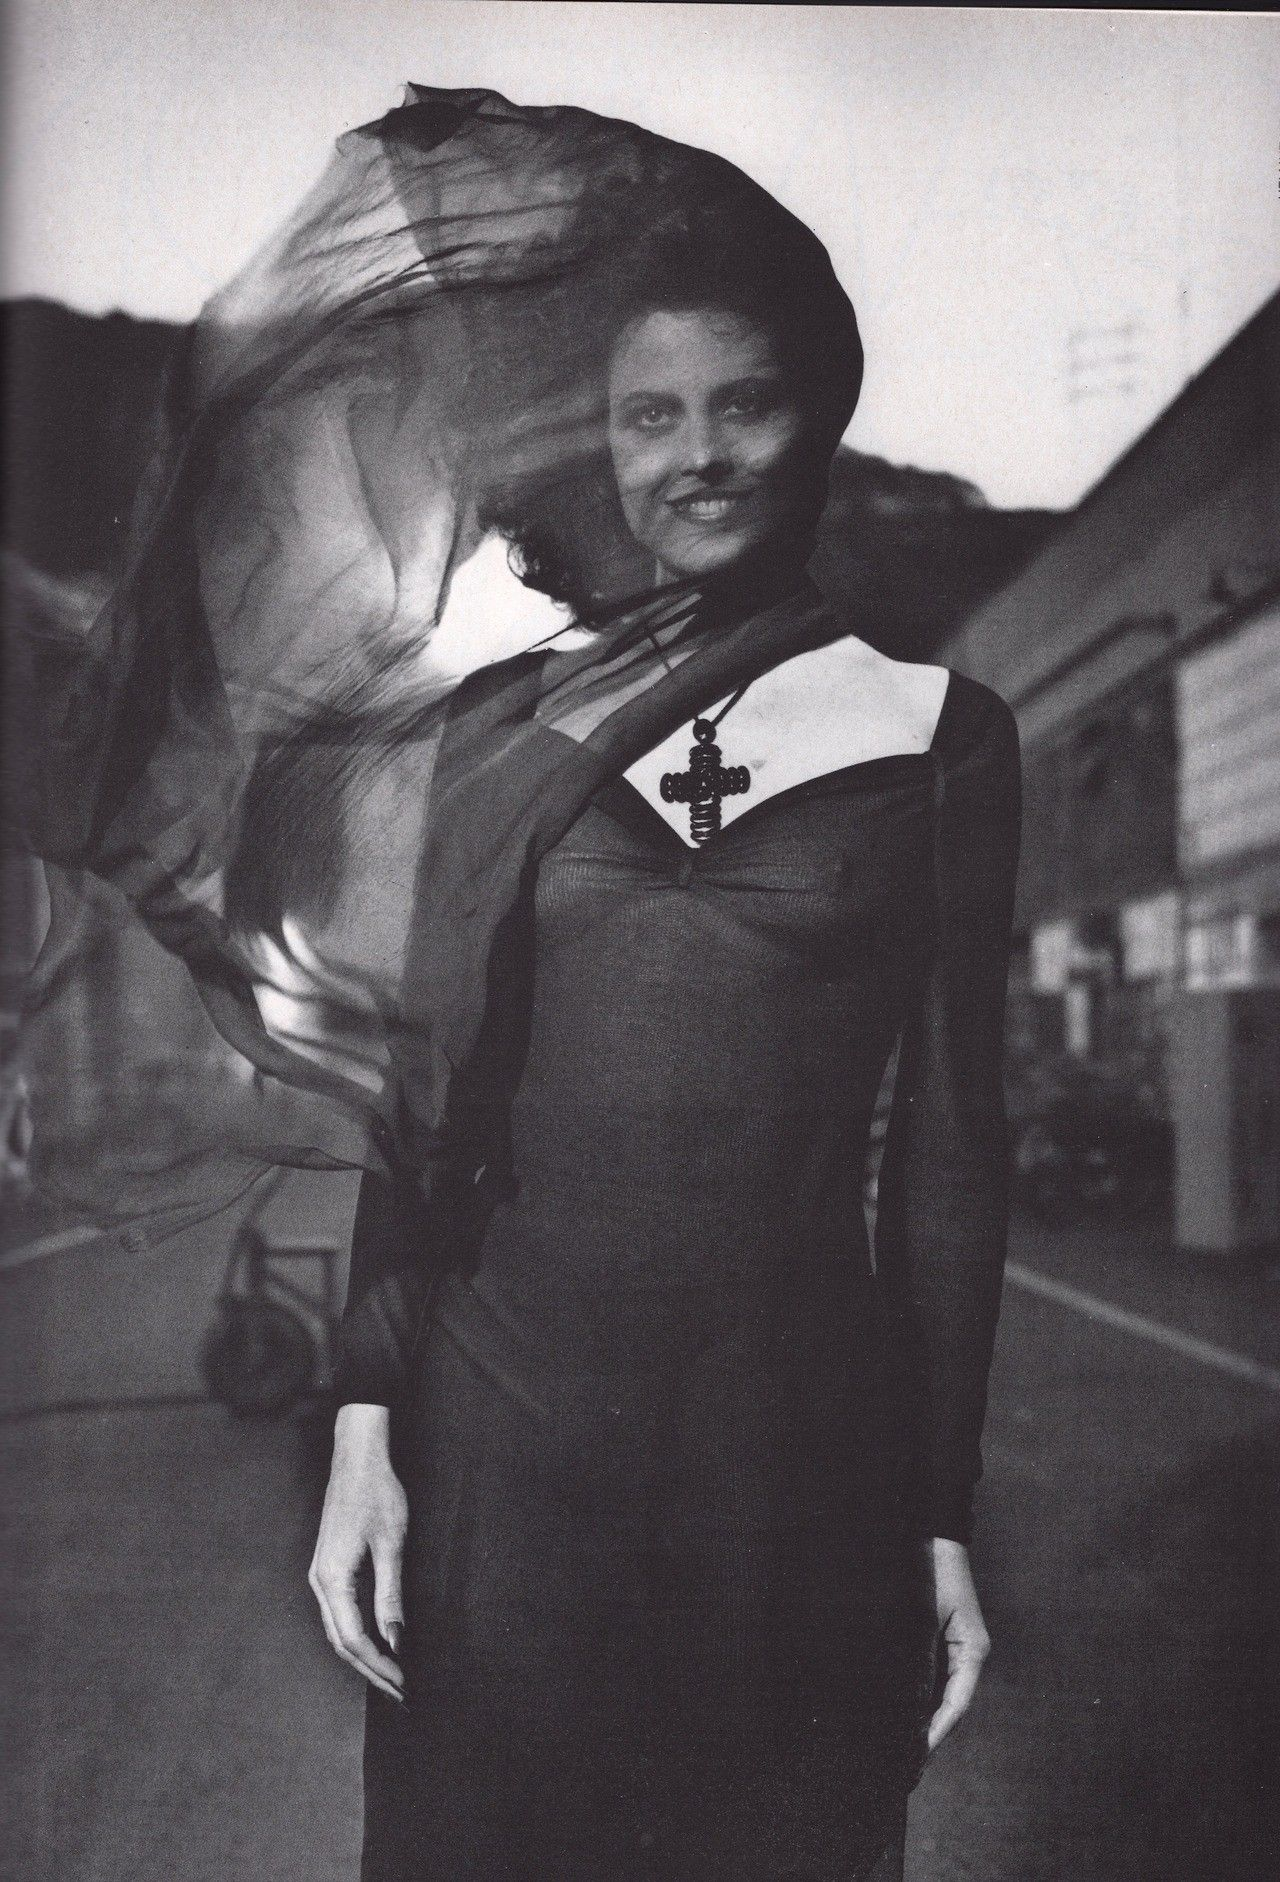 Sigourney Weaver for Vogue Italia 1983 shot by Helmut Newton.